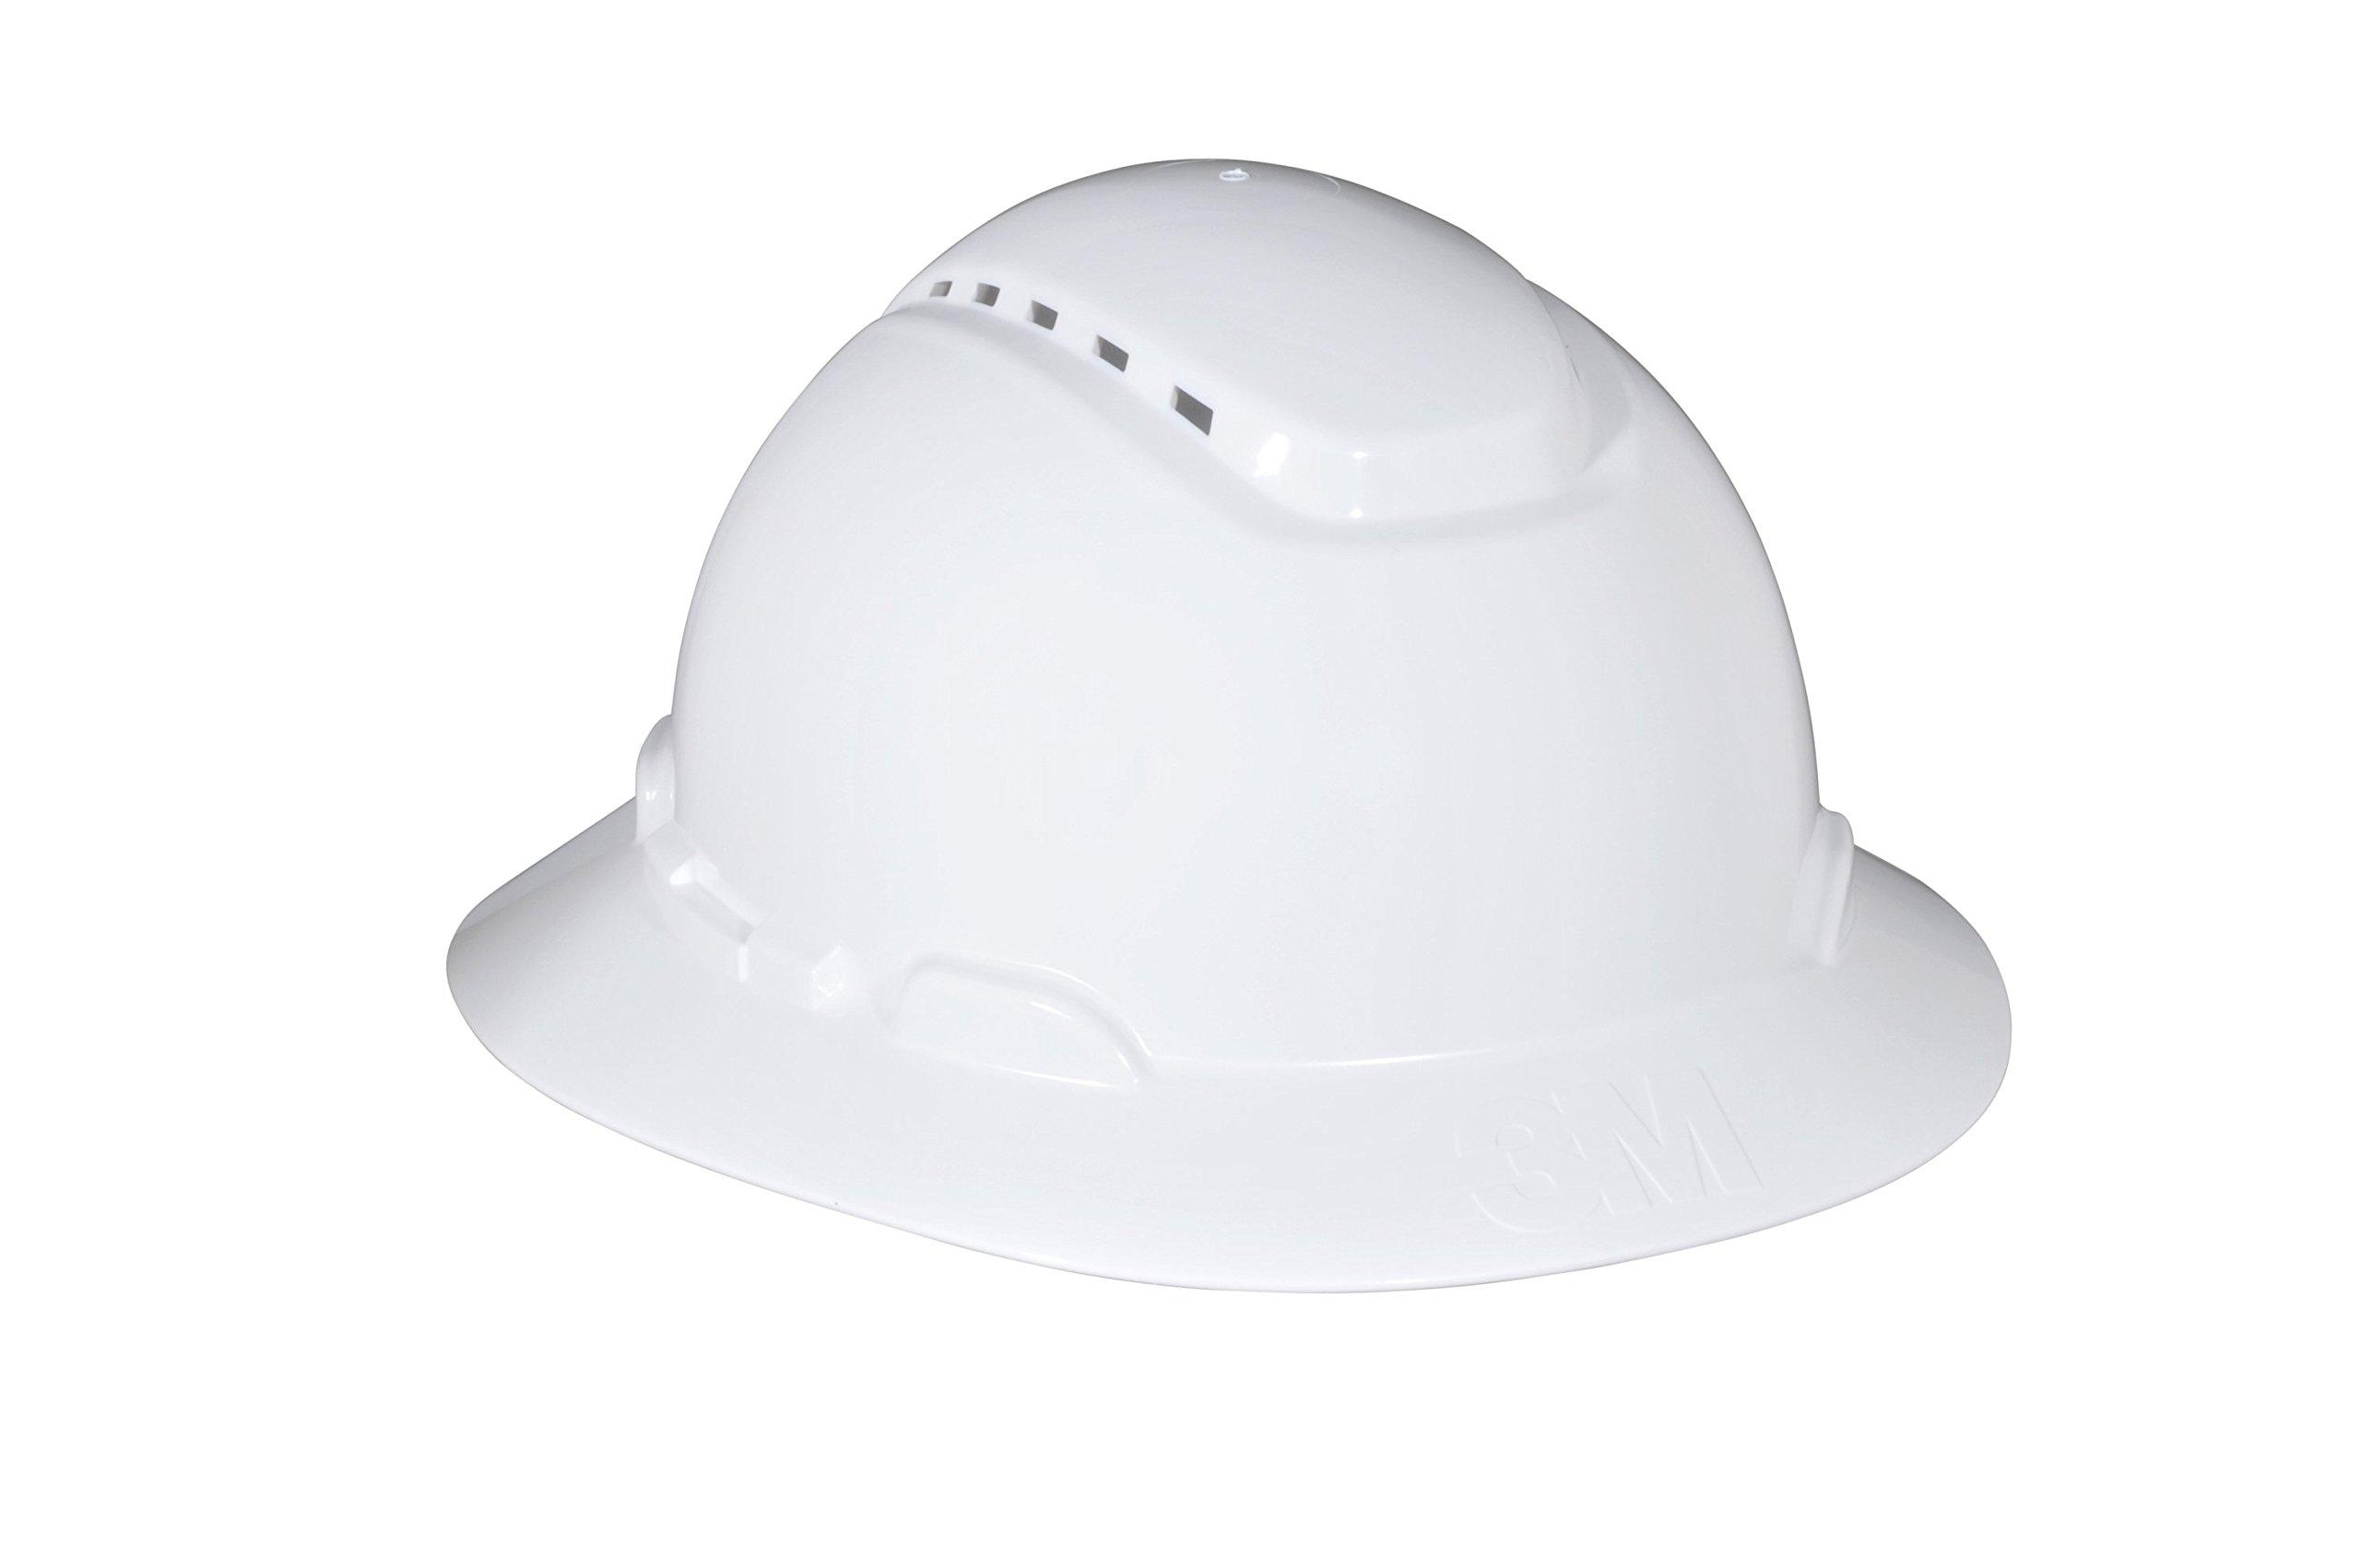 3M Full Brim Hard Hat H-801V, 4-Point Ratchet Suspension, Vented, White